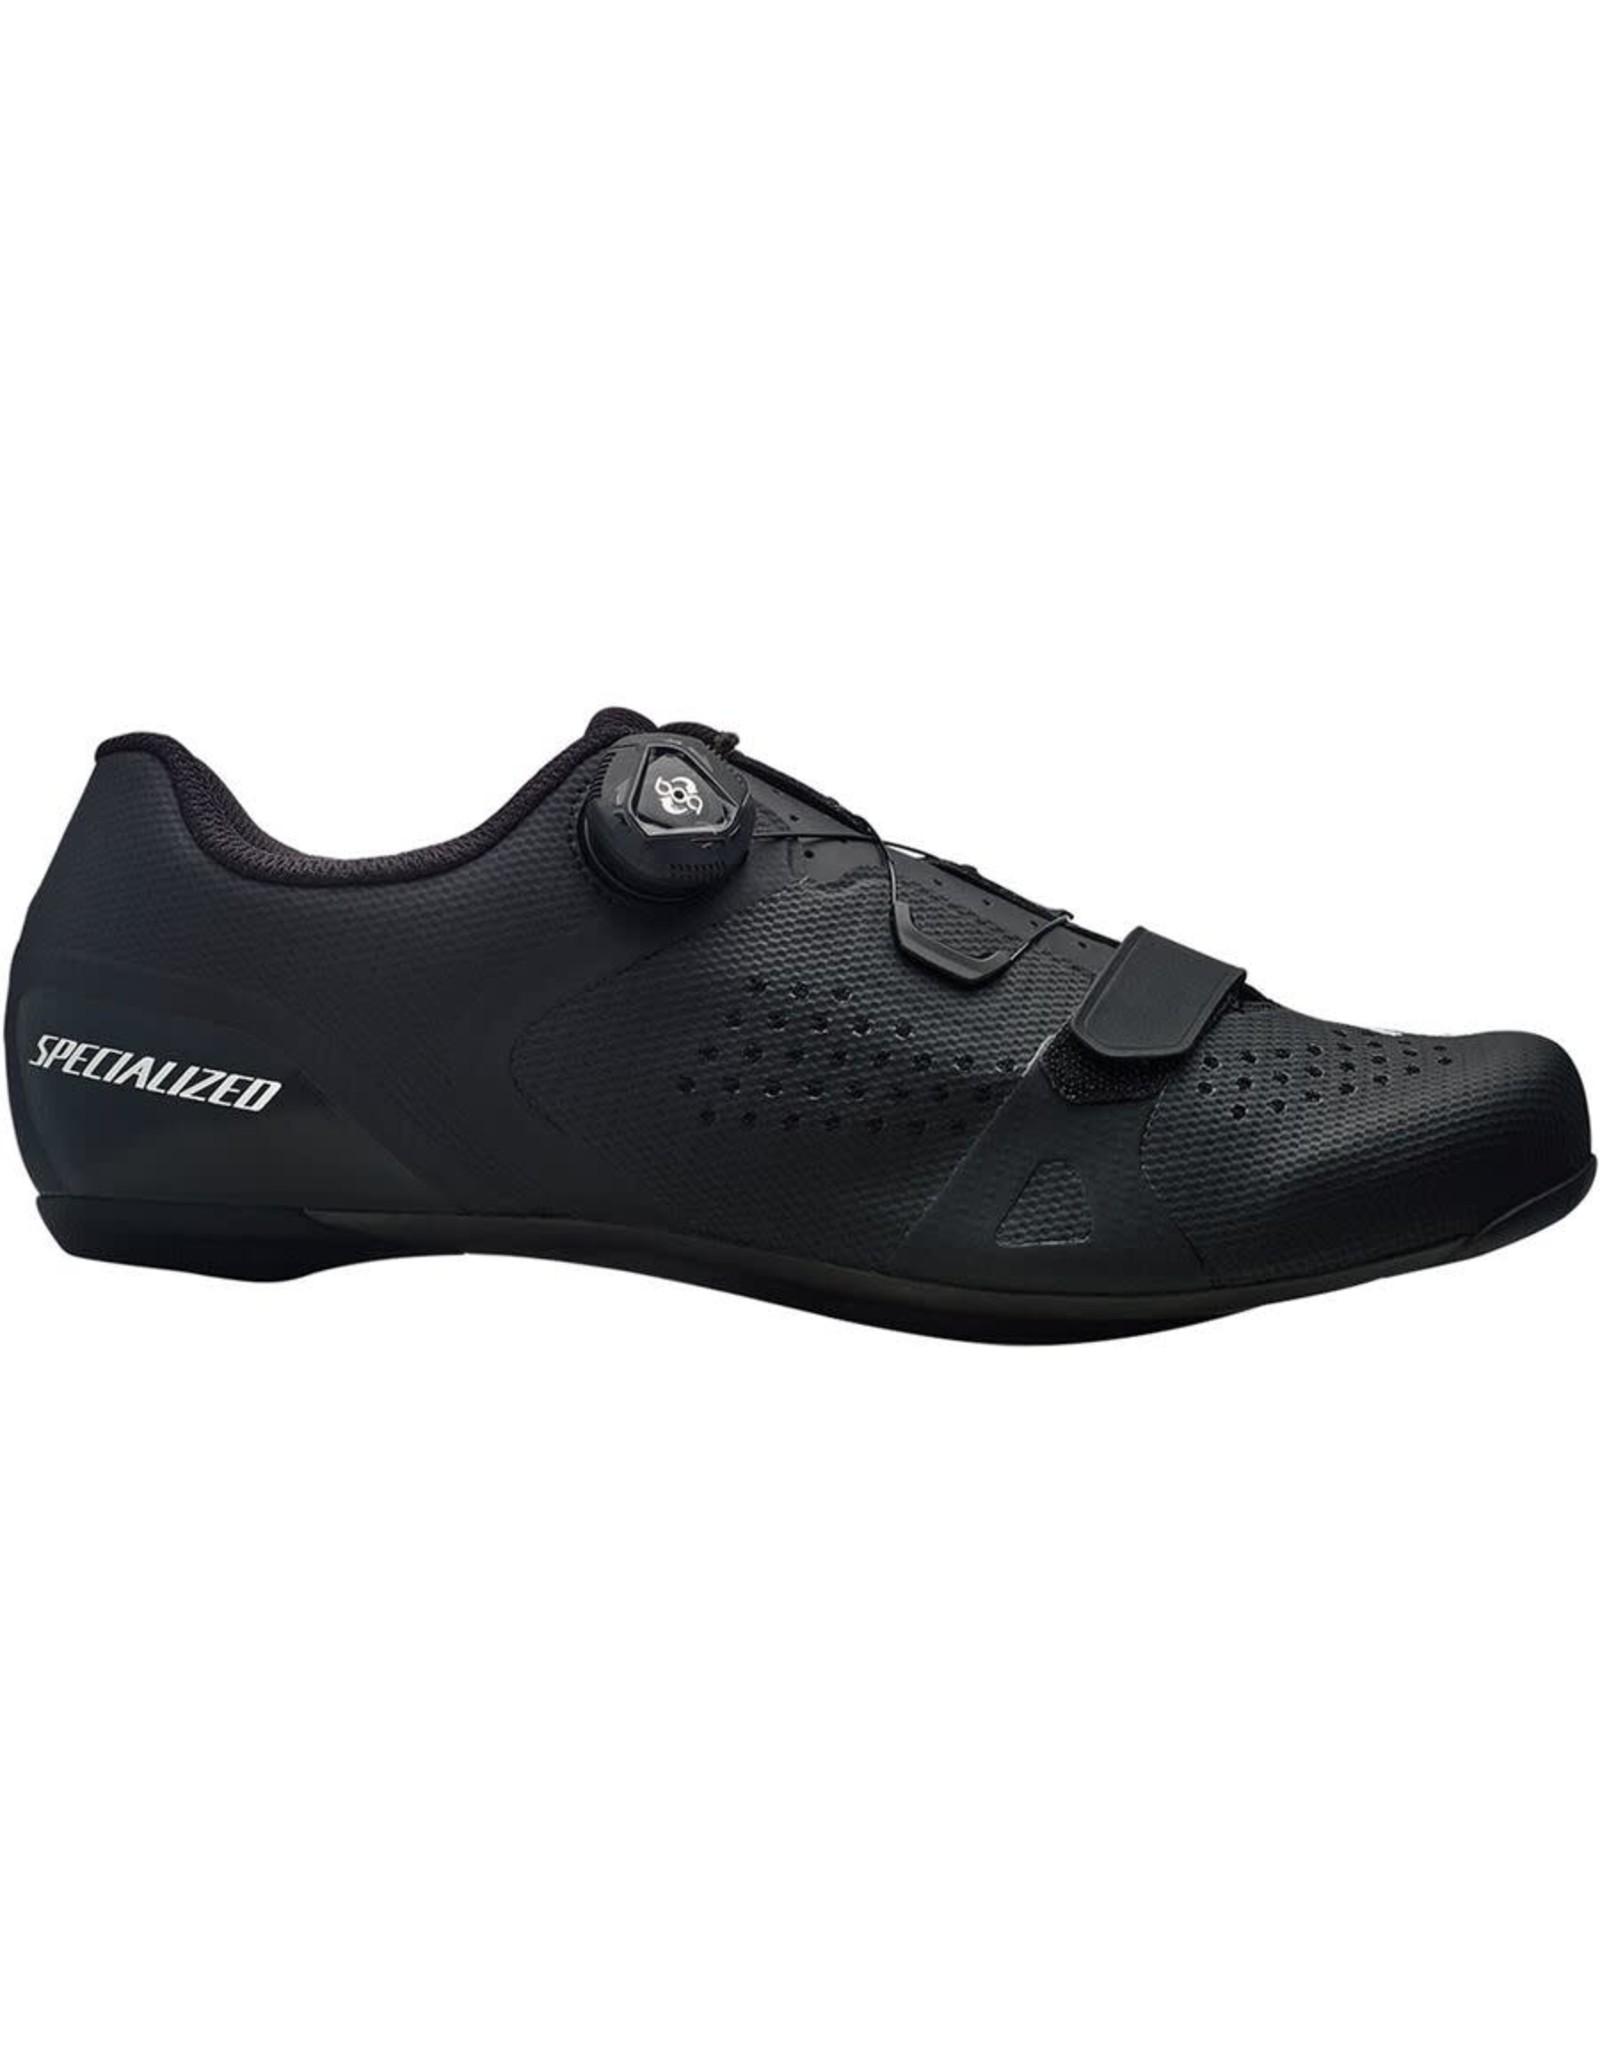 Specialized Shoe Spec Torch 2.0 Road Blk 45.5